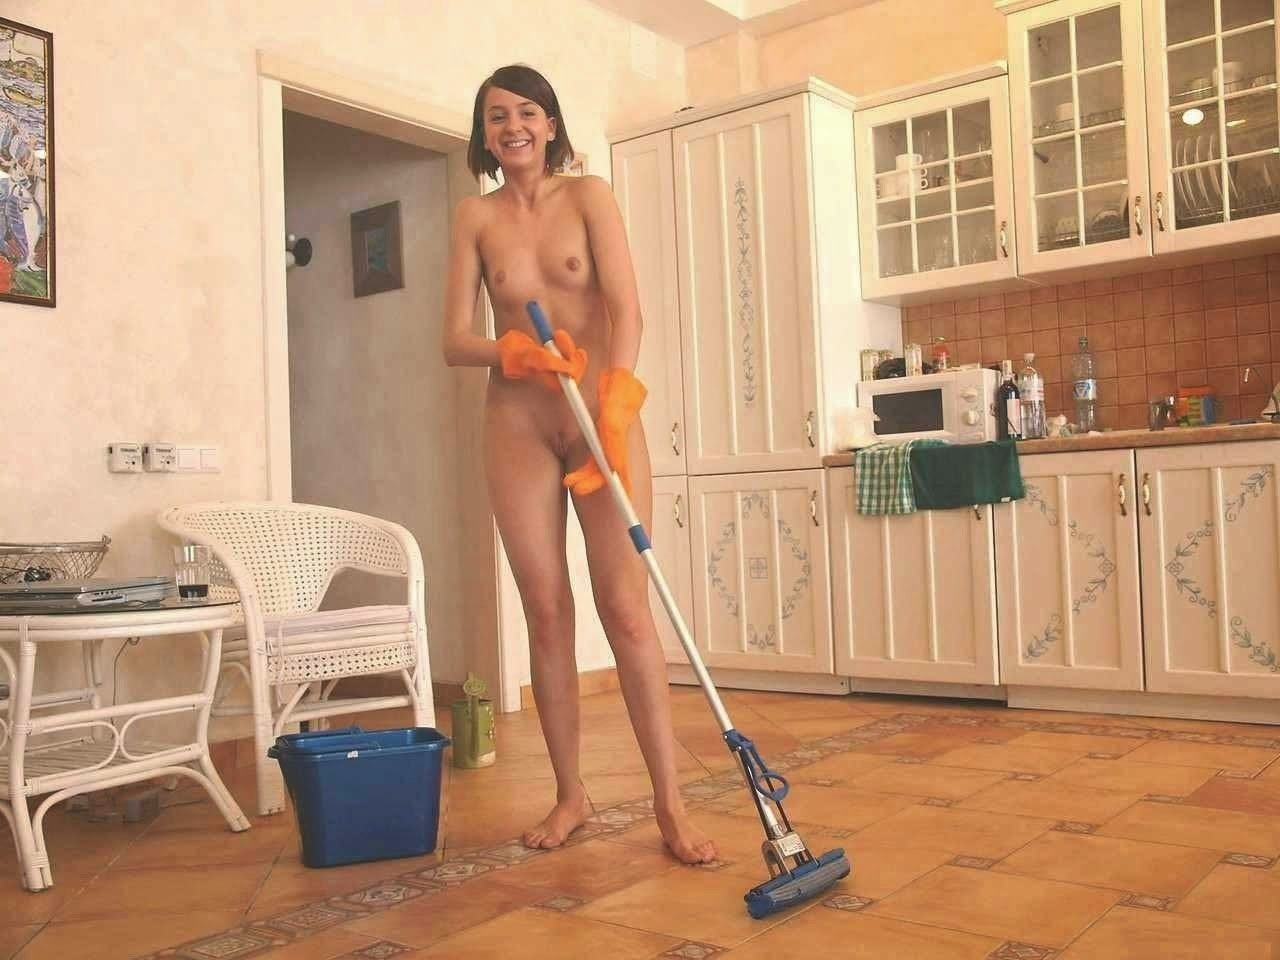 Topless Housework